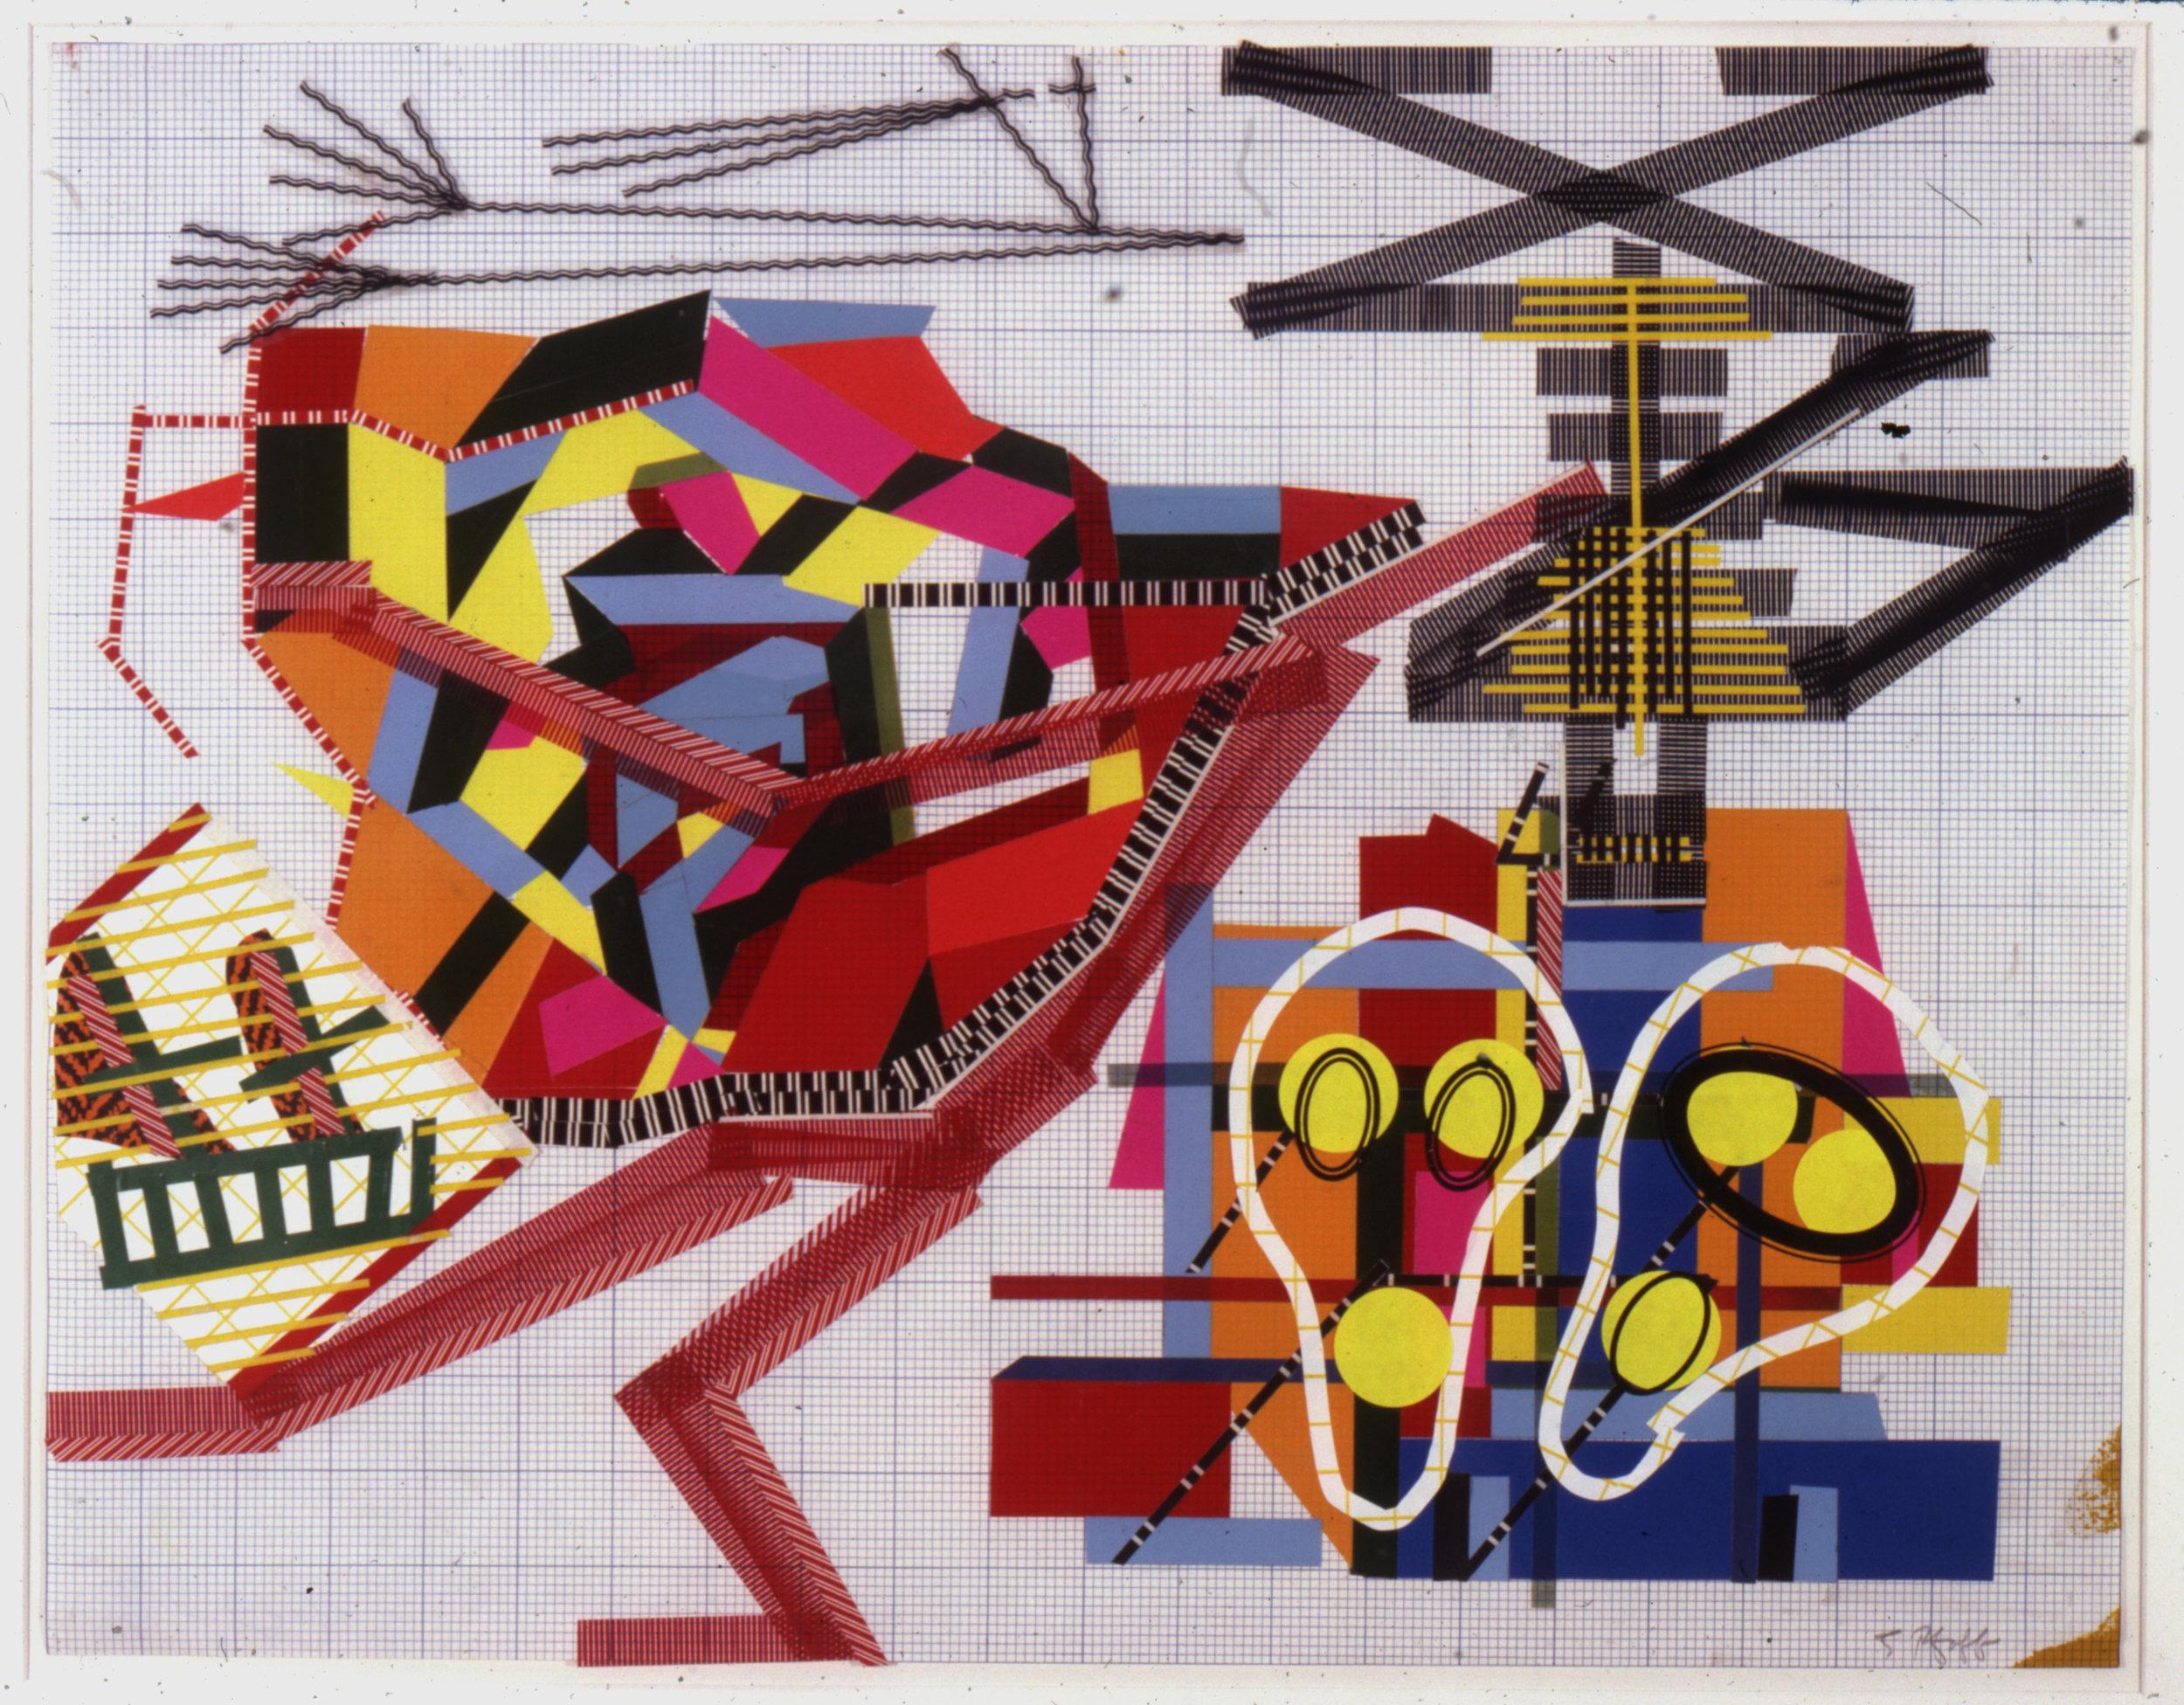 Untitled II, 1985